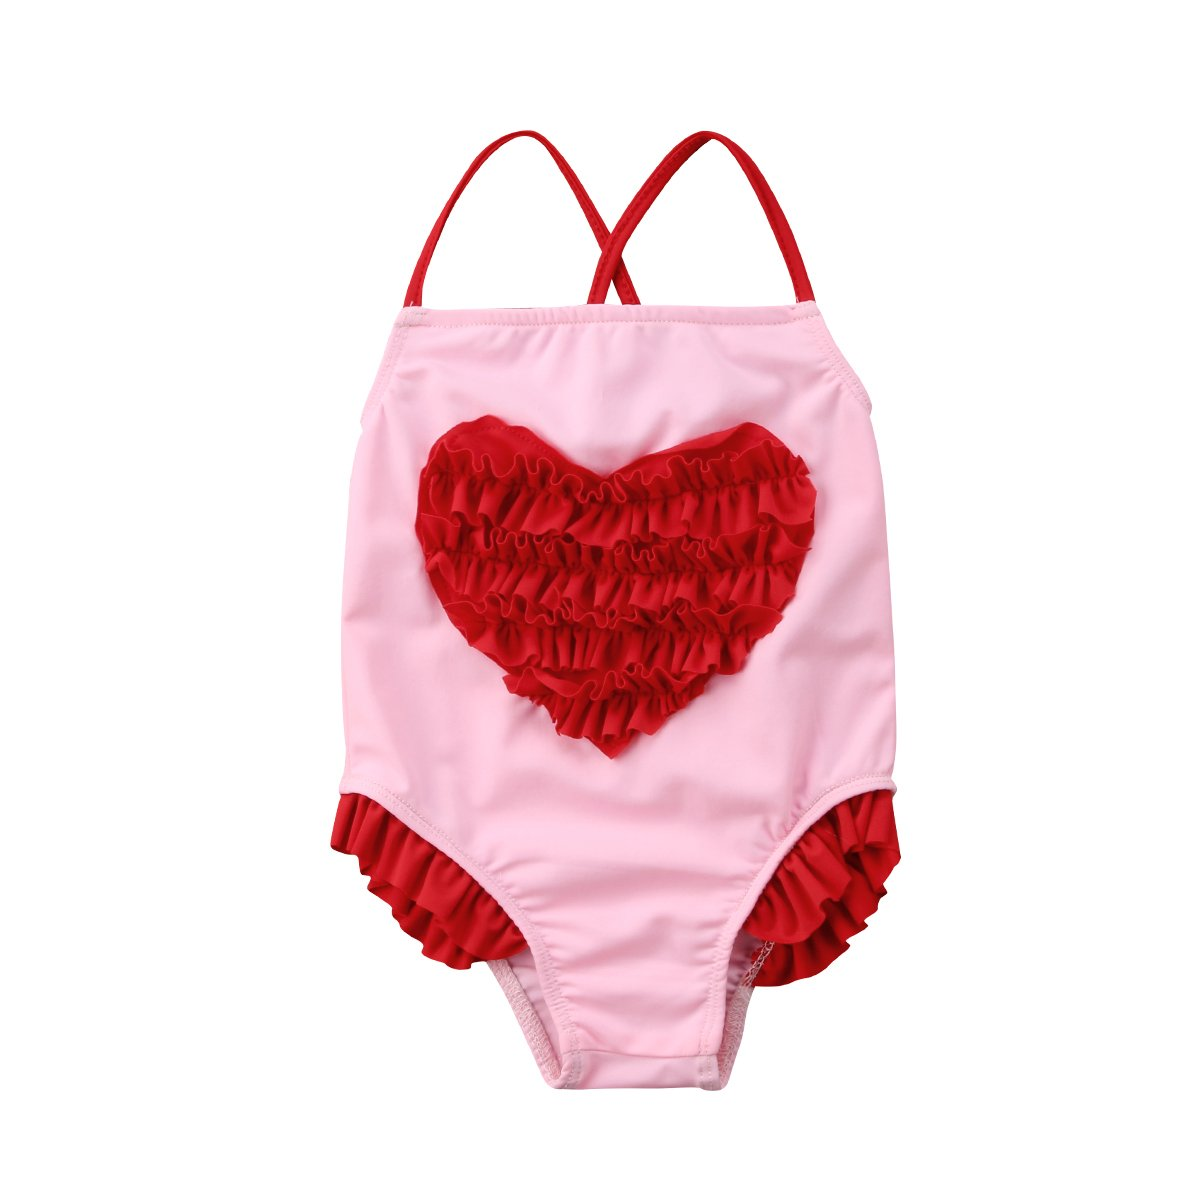 cd3bd9e0647d2 Amazon.com: Newborn Baby Girl Floral Swimsuit Heart Ruffles Bathing Suit  Bikini Straps Swimwear for Baby Girls Beach Wear: Clothing